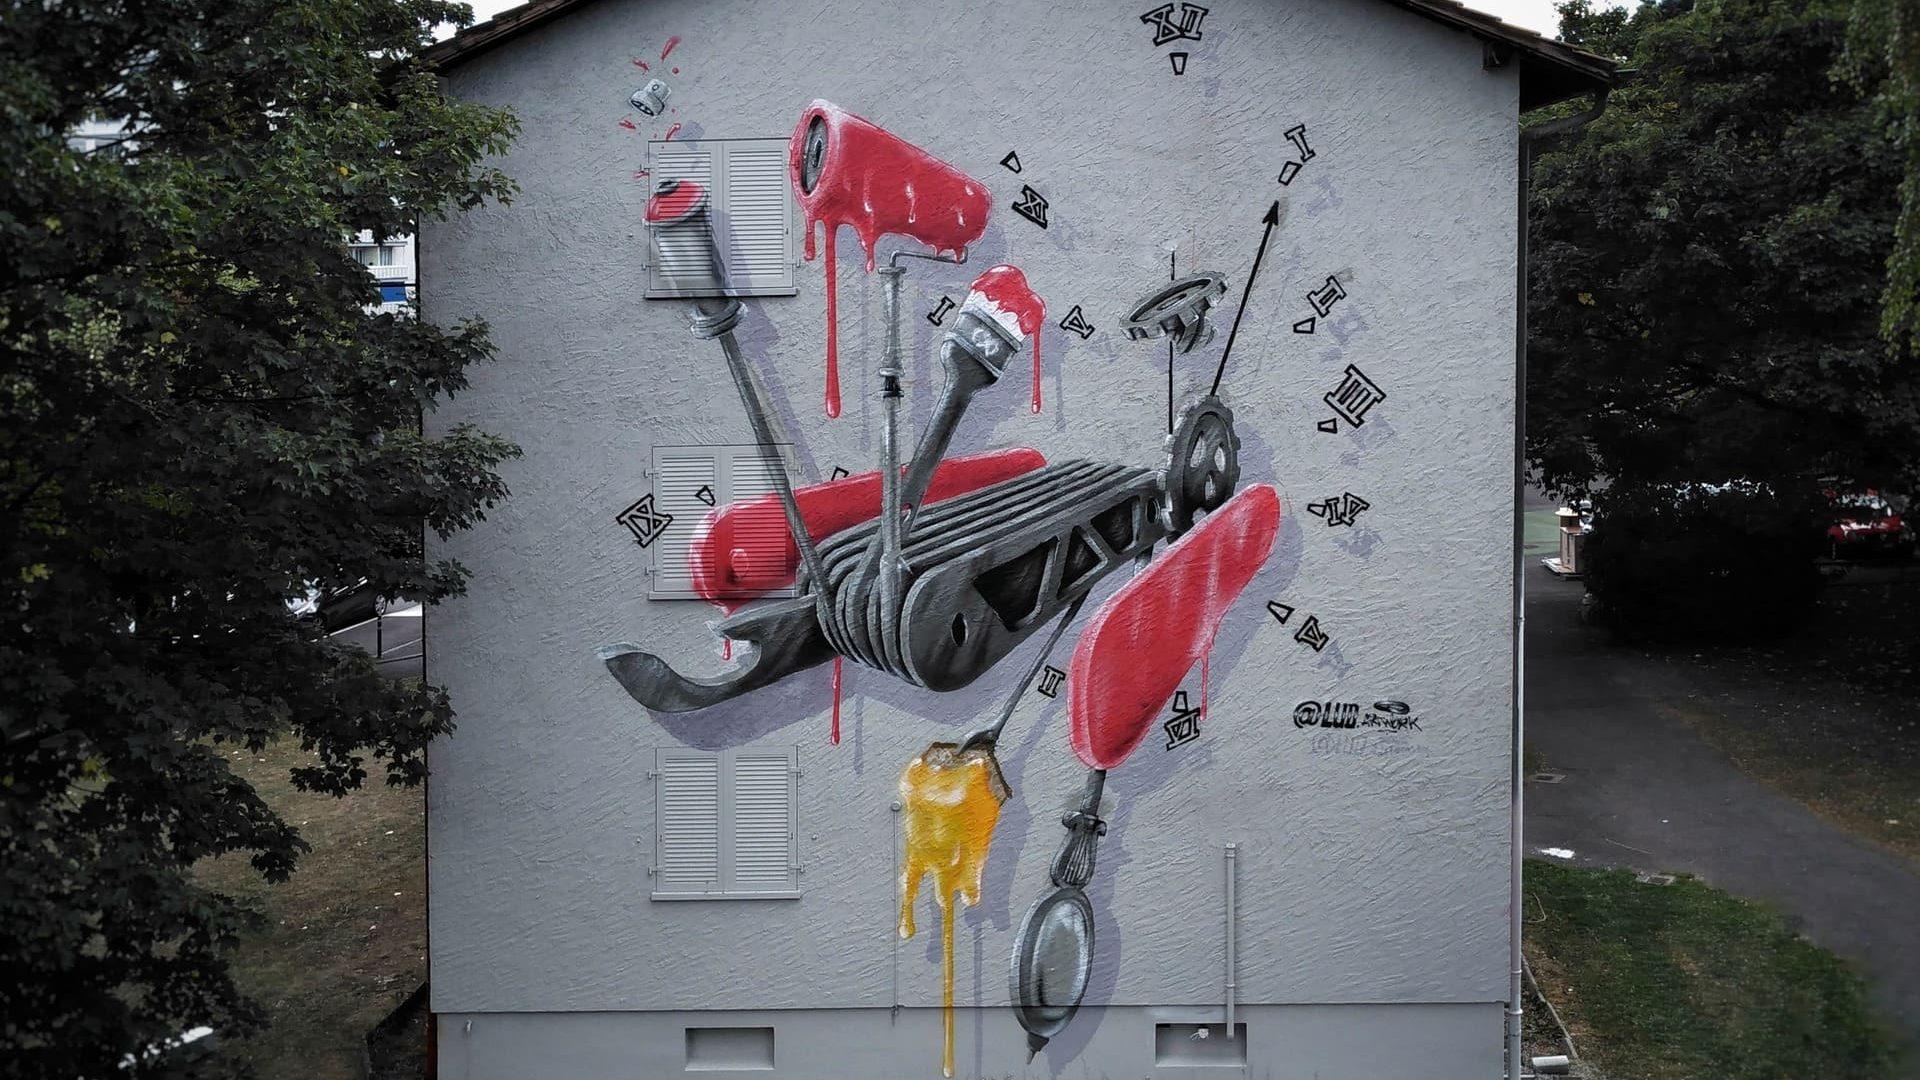 street art graffiti fresque graffiti murale couteau suisse rouge facade